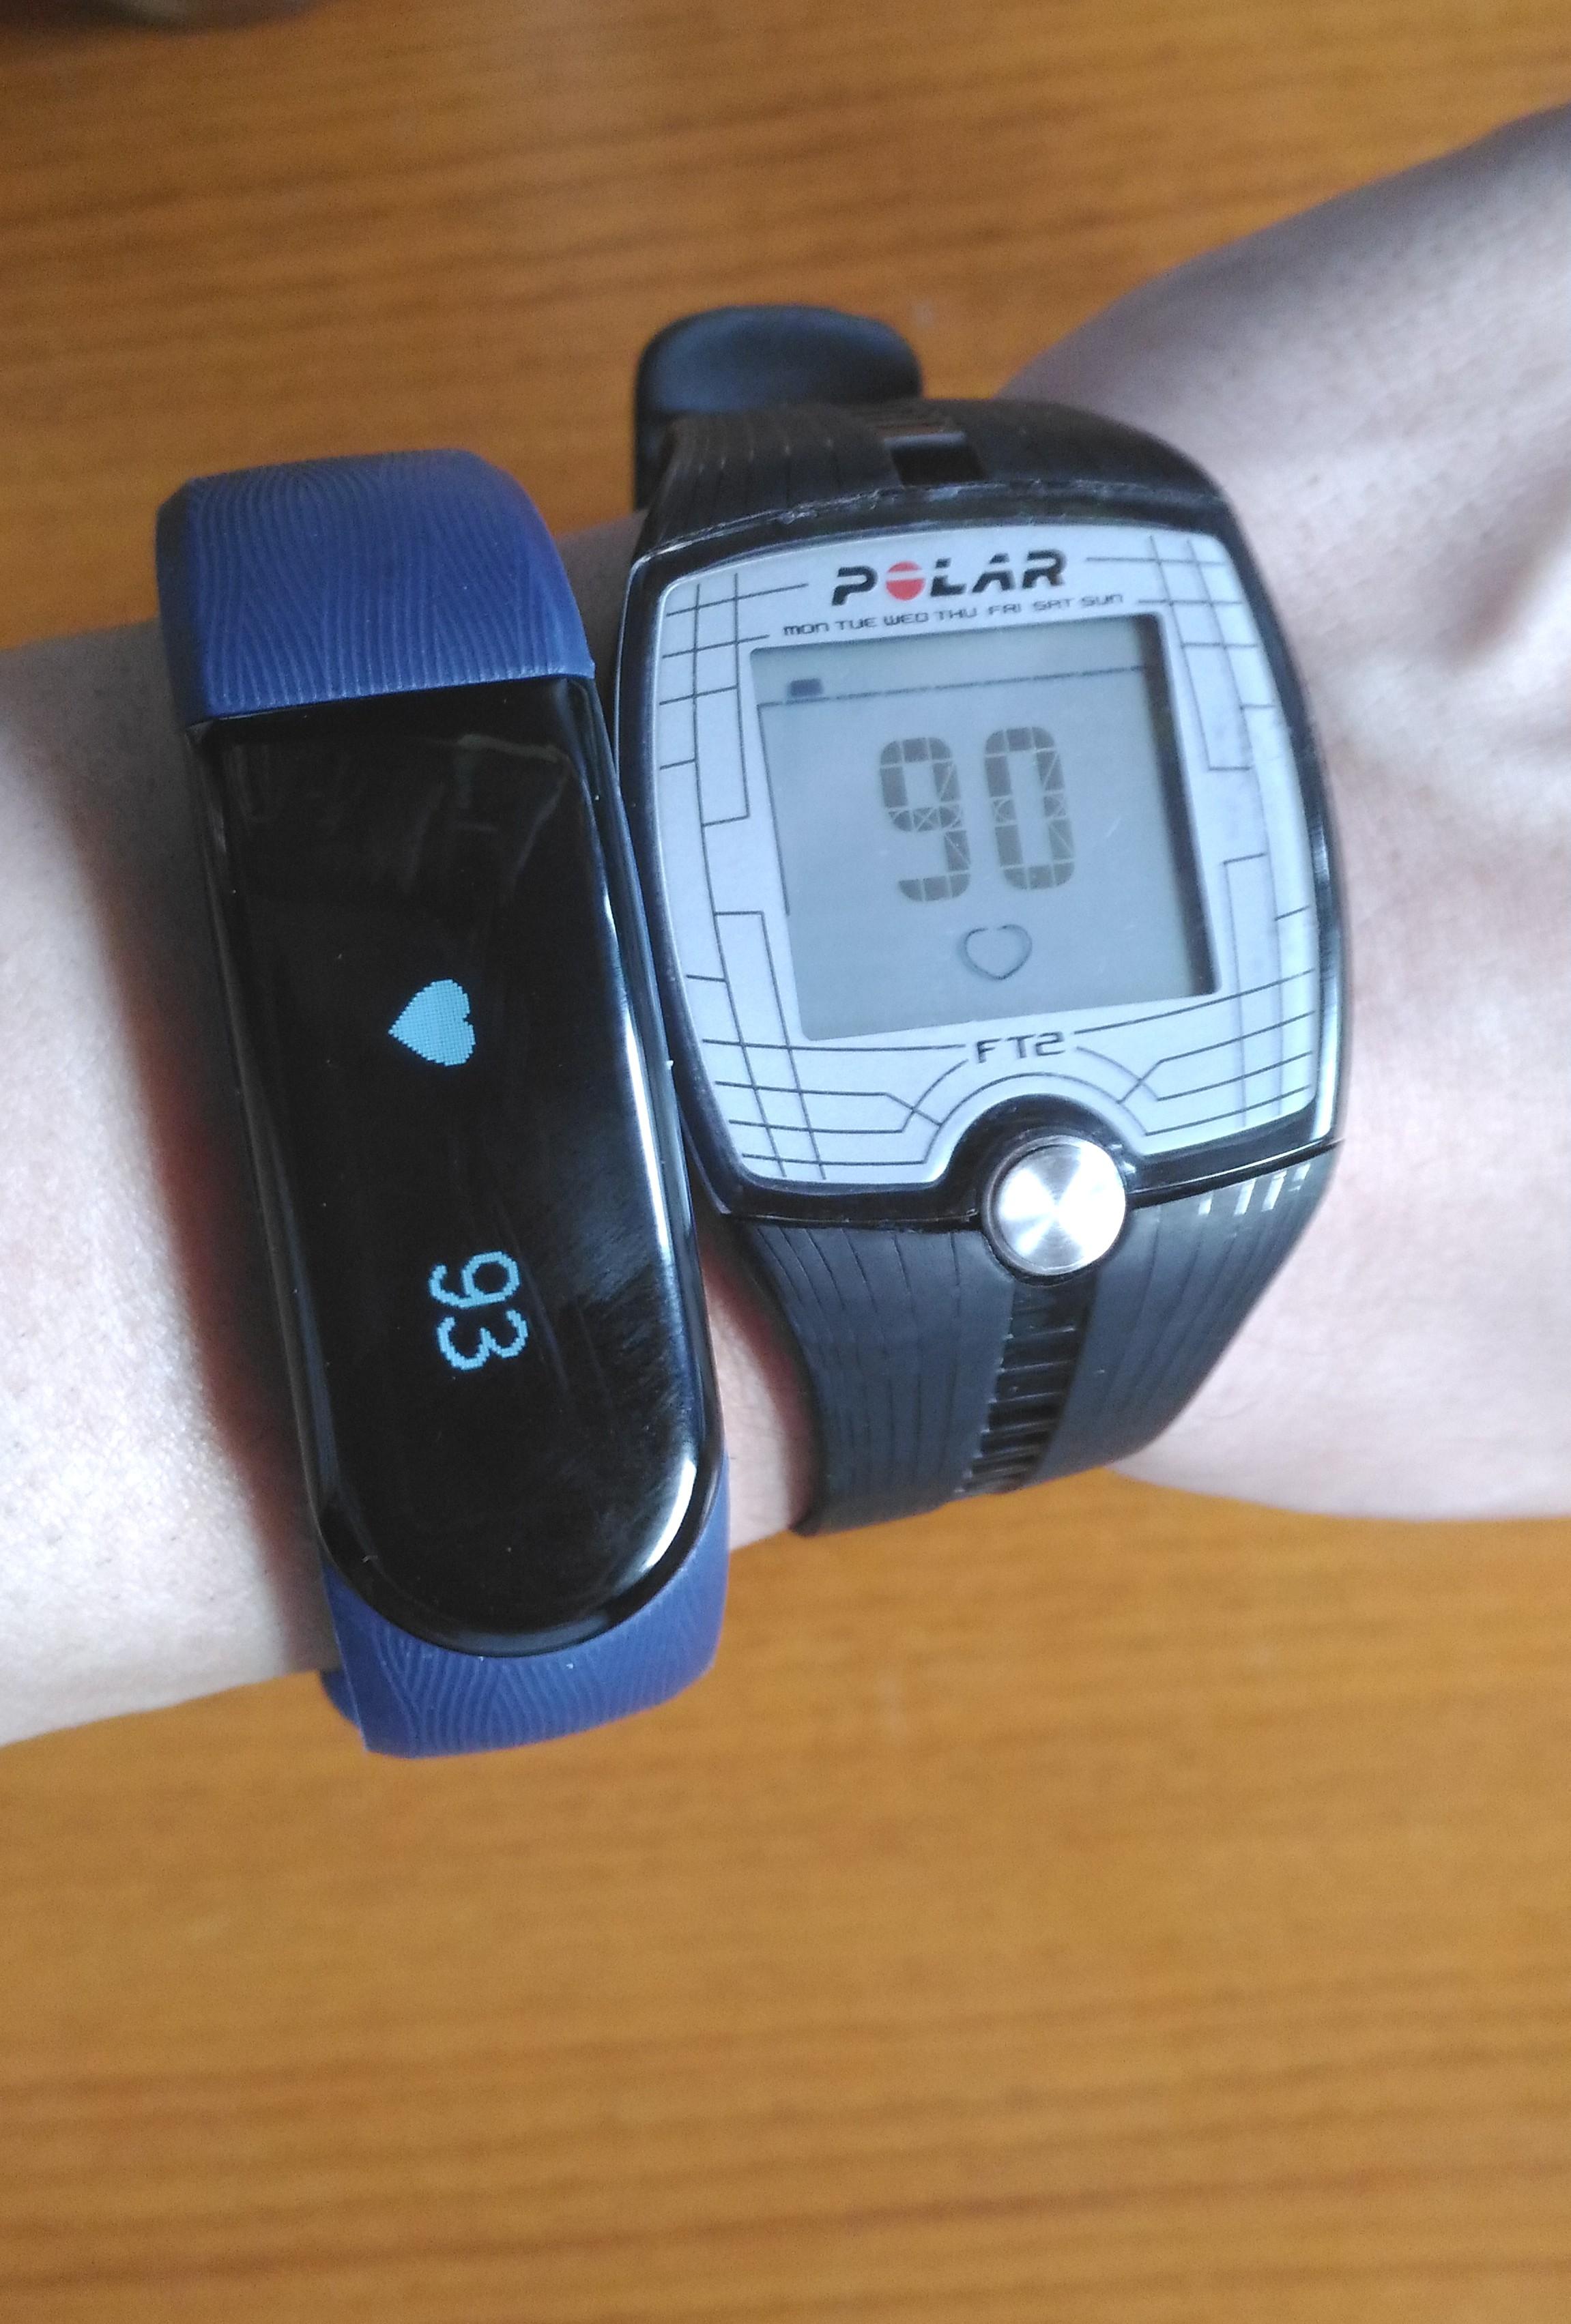 LETSCOM 活動量計 心拍計 ID101HR とpolar心拍計の比較